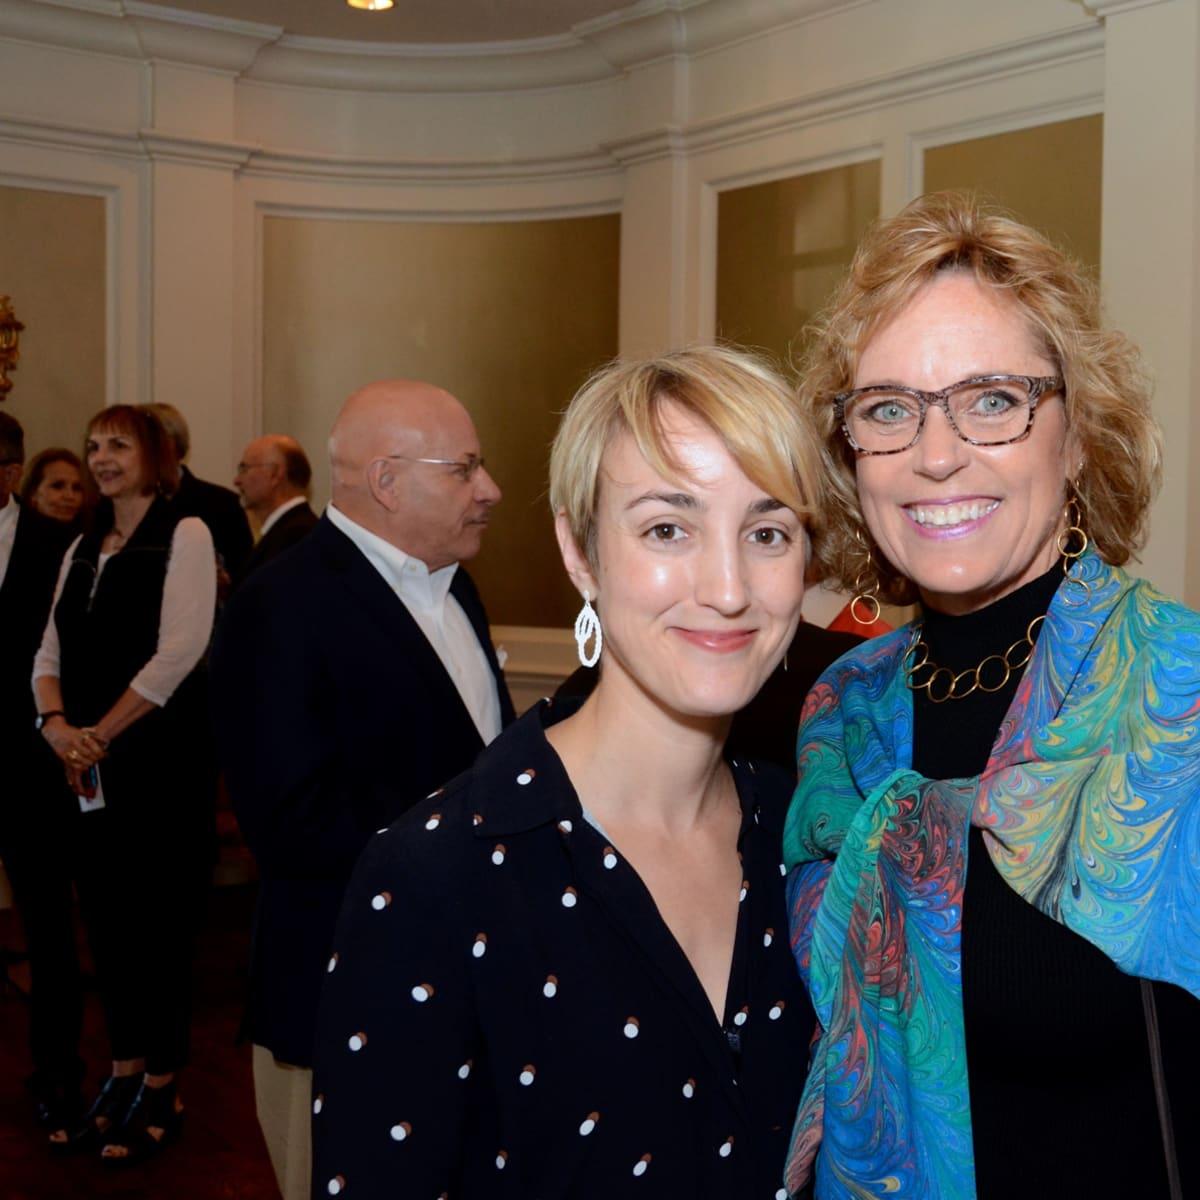 Center for Contemporary Craft, 4/16 Sarah Sudhoff, Susan Budge